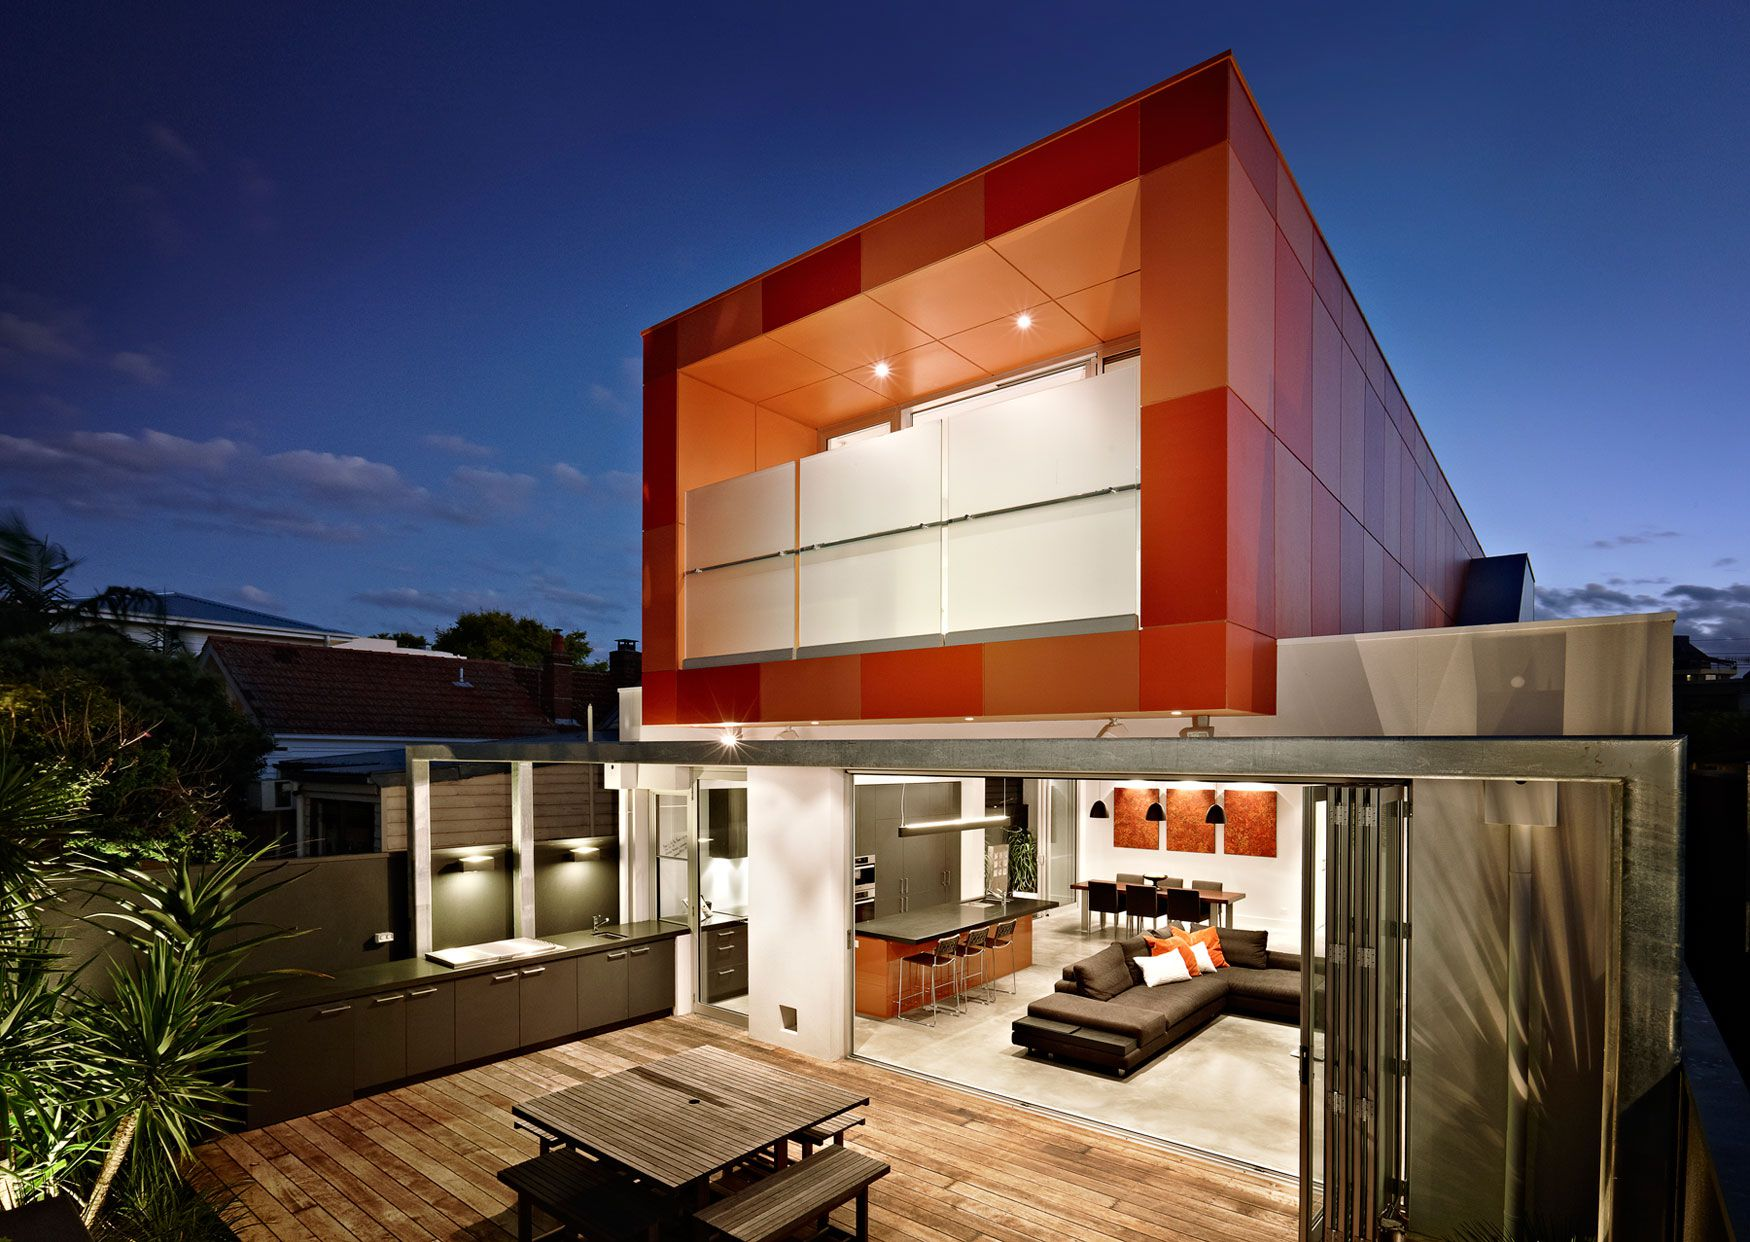 Dise o de casa moderna de dos plantas planos construye - Disenos de casas de dos plantas modernas ...